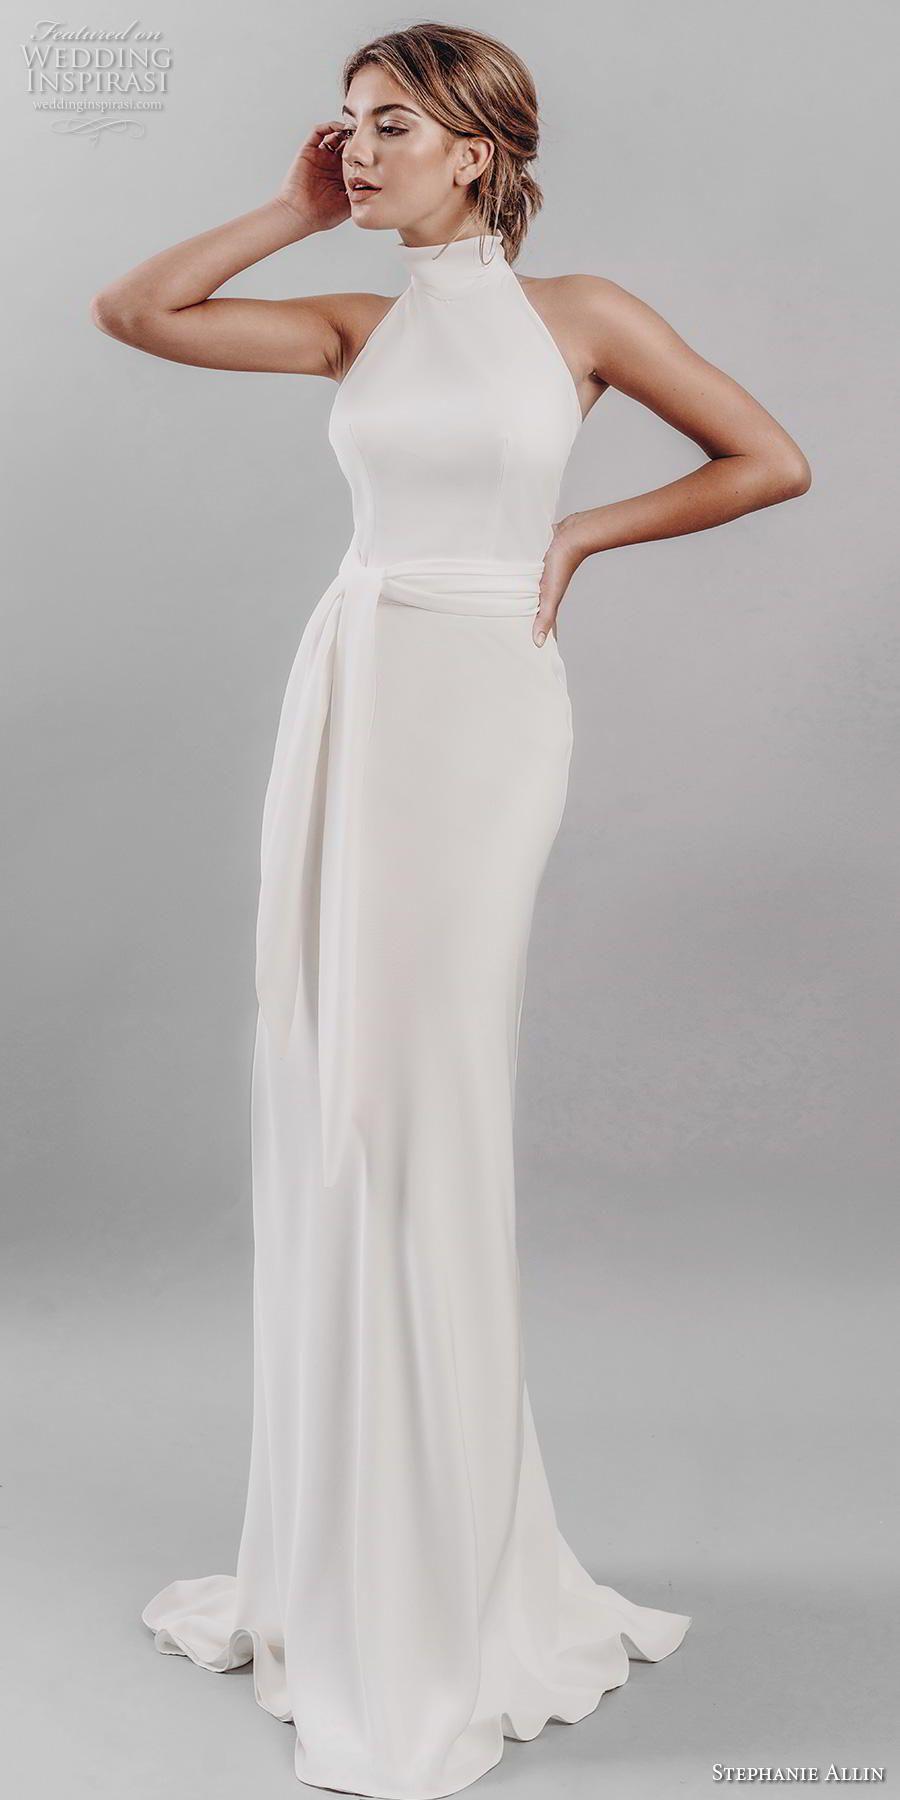 7e3d4e61920ca stephanie allin 2019 bridal sleeveless halter neck simple clean minimalist  elegant sheath wedding dress mid back sweep train (14) mv -- Stephanie  Allin 2019 ...